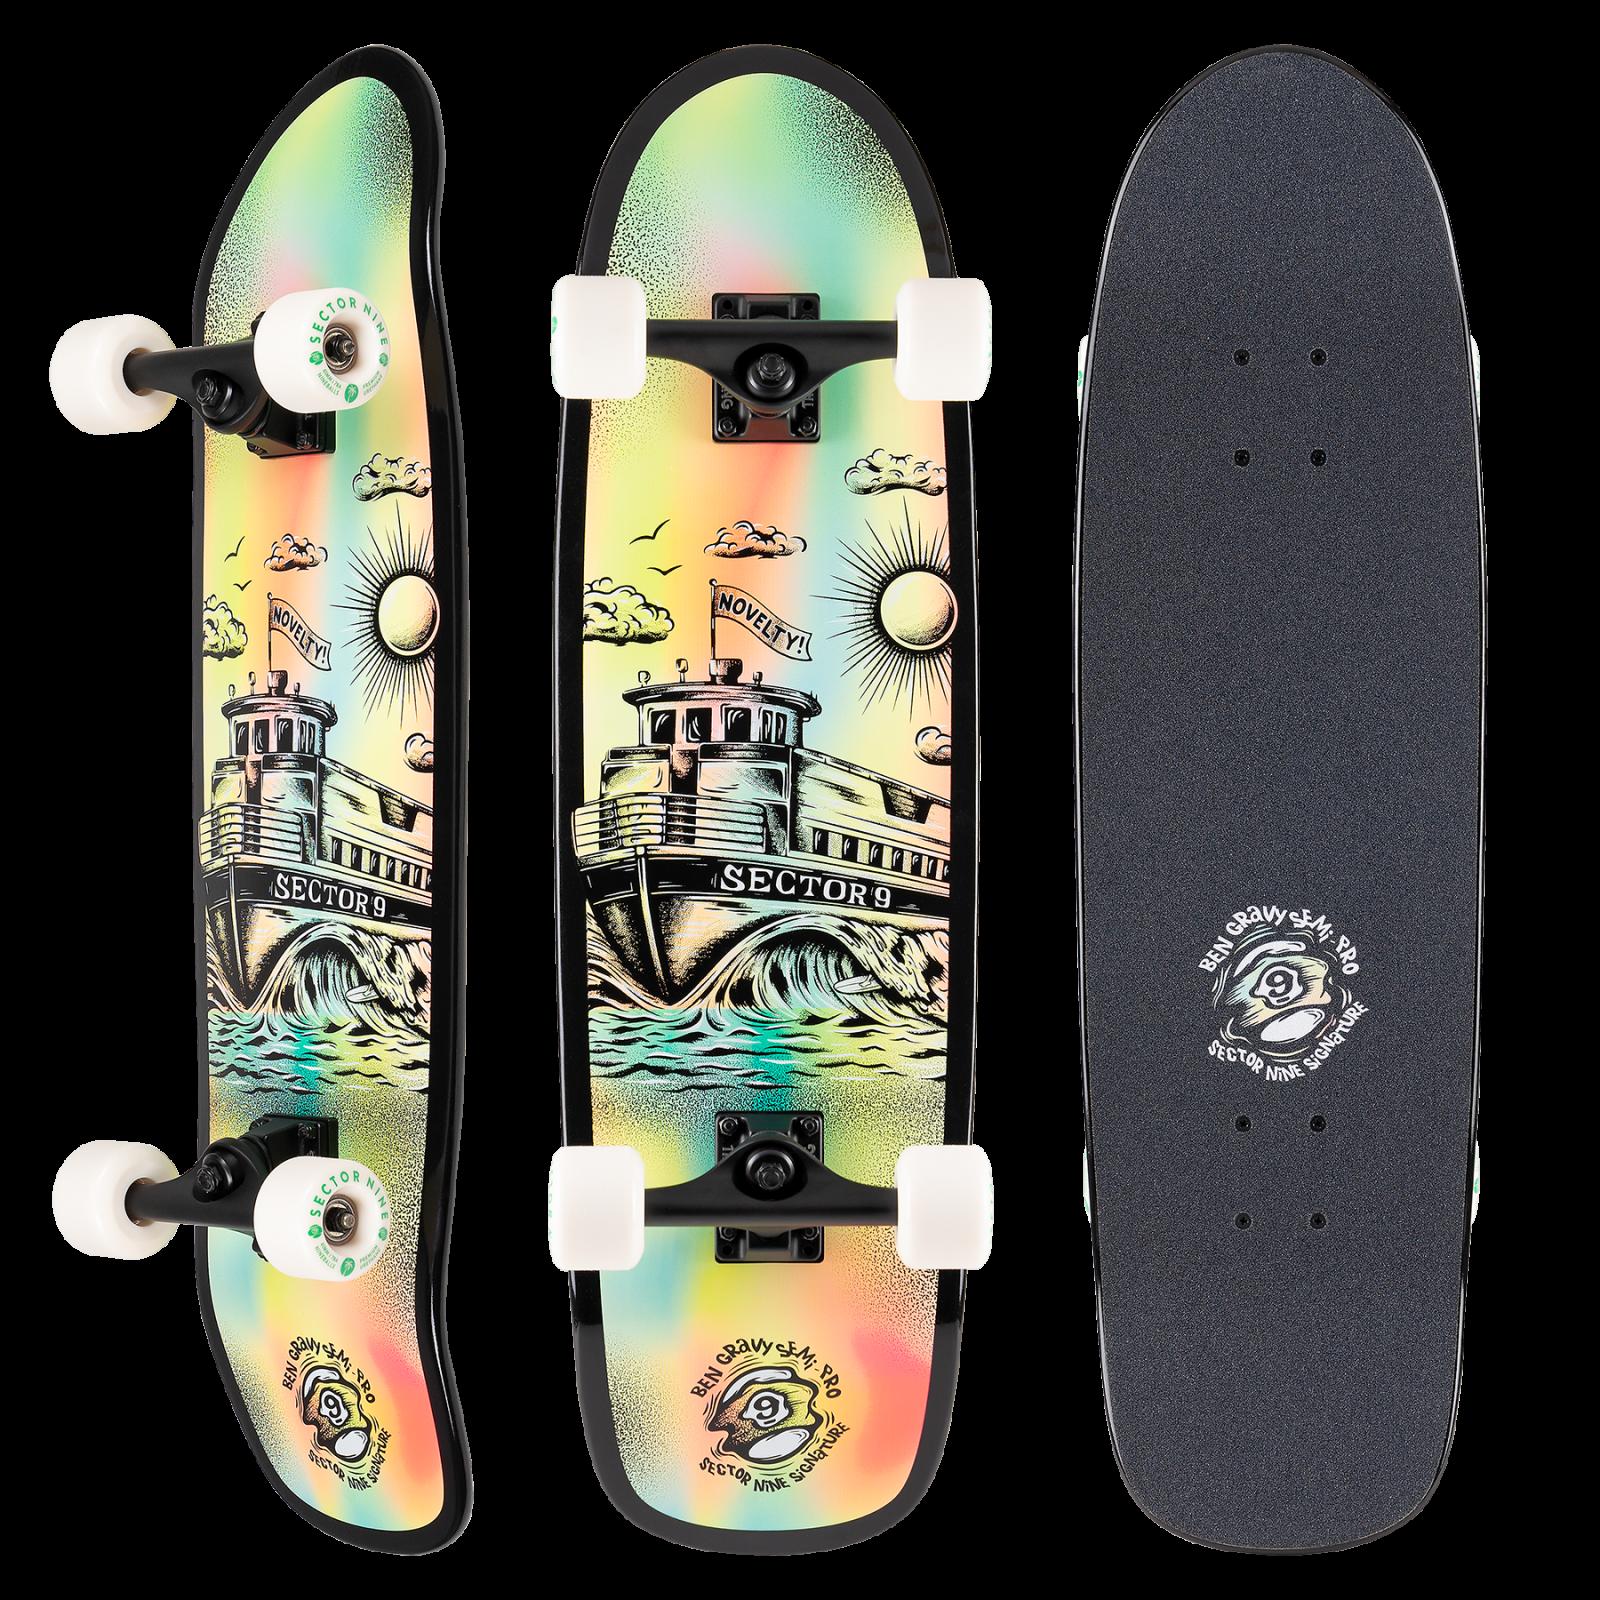 Sector 9 Gravy Semi-Pro Barge Cruiser Skateboard Complete